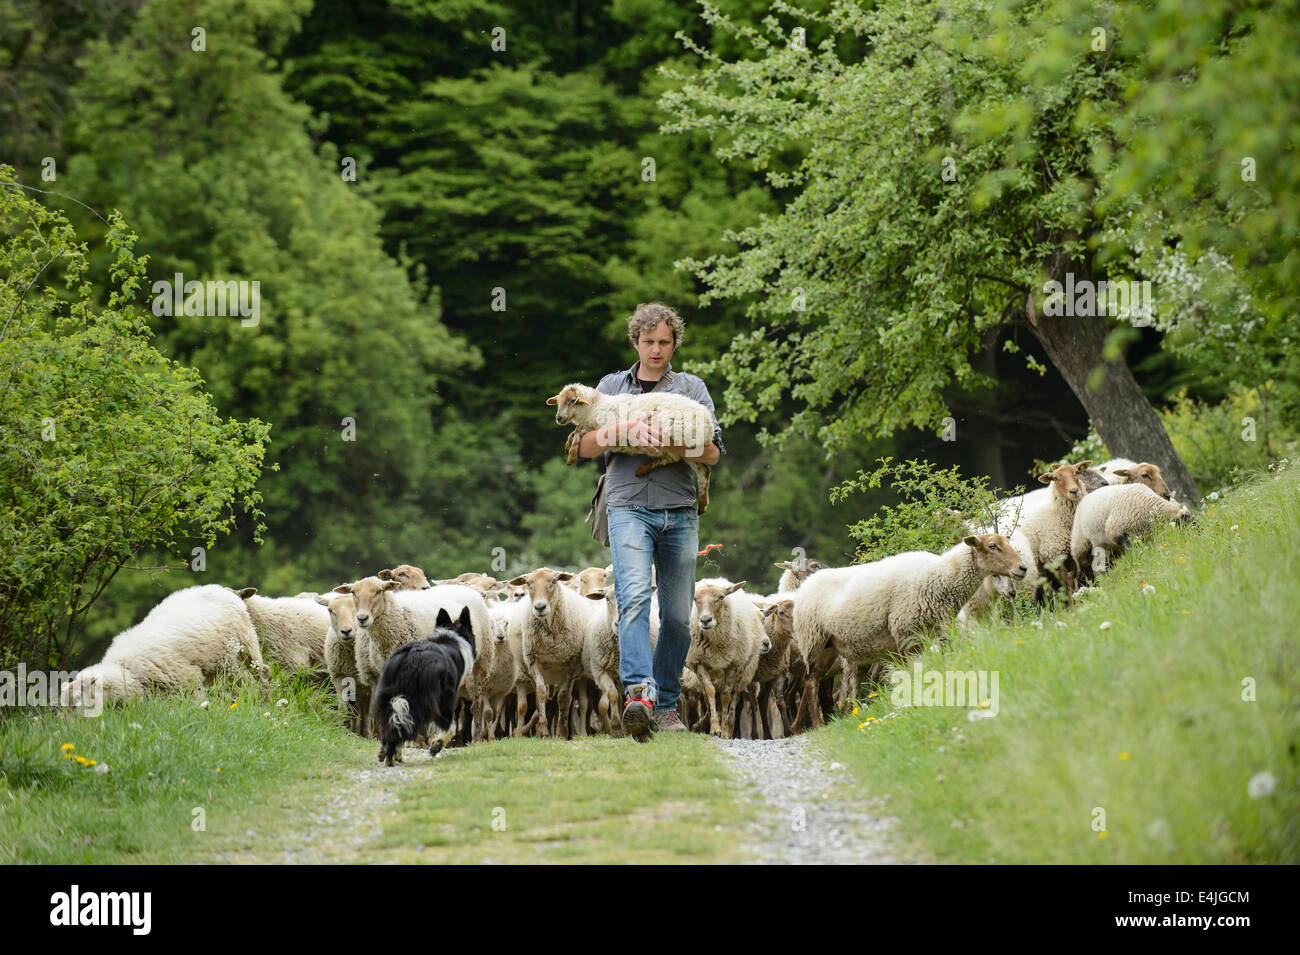 Shepherd with a flock of sheep following him, carrying a hurt lamb. - Stock Image